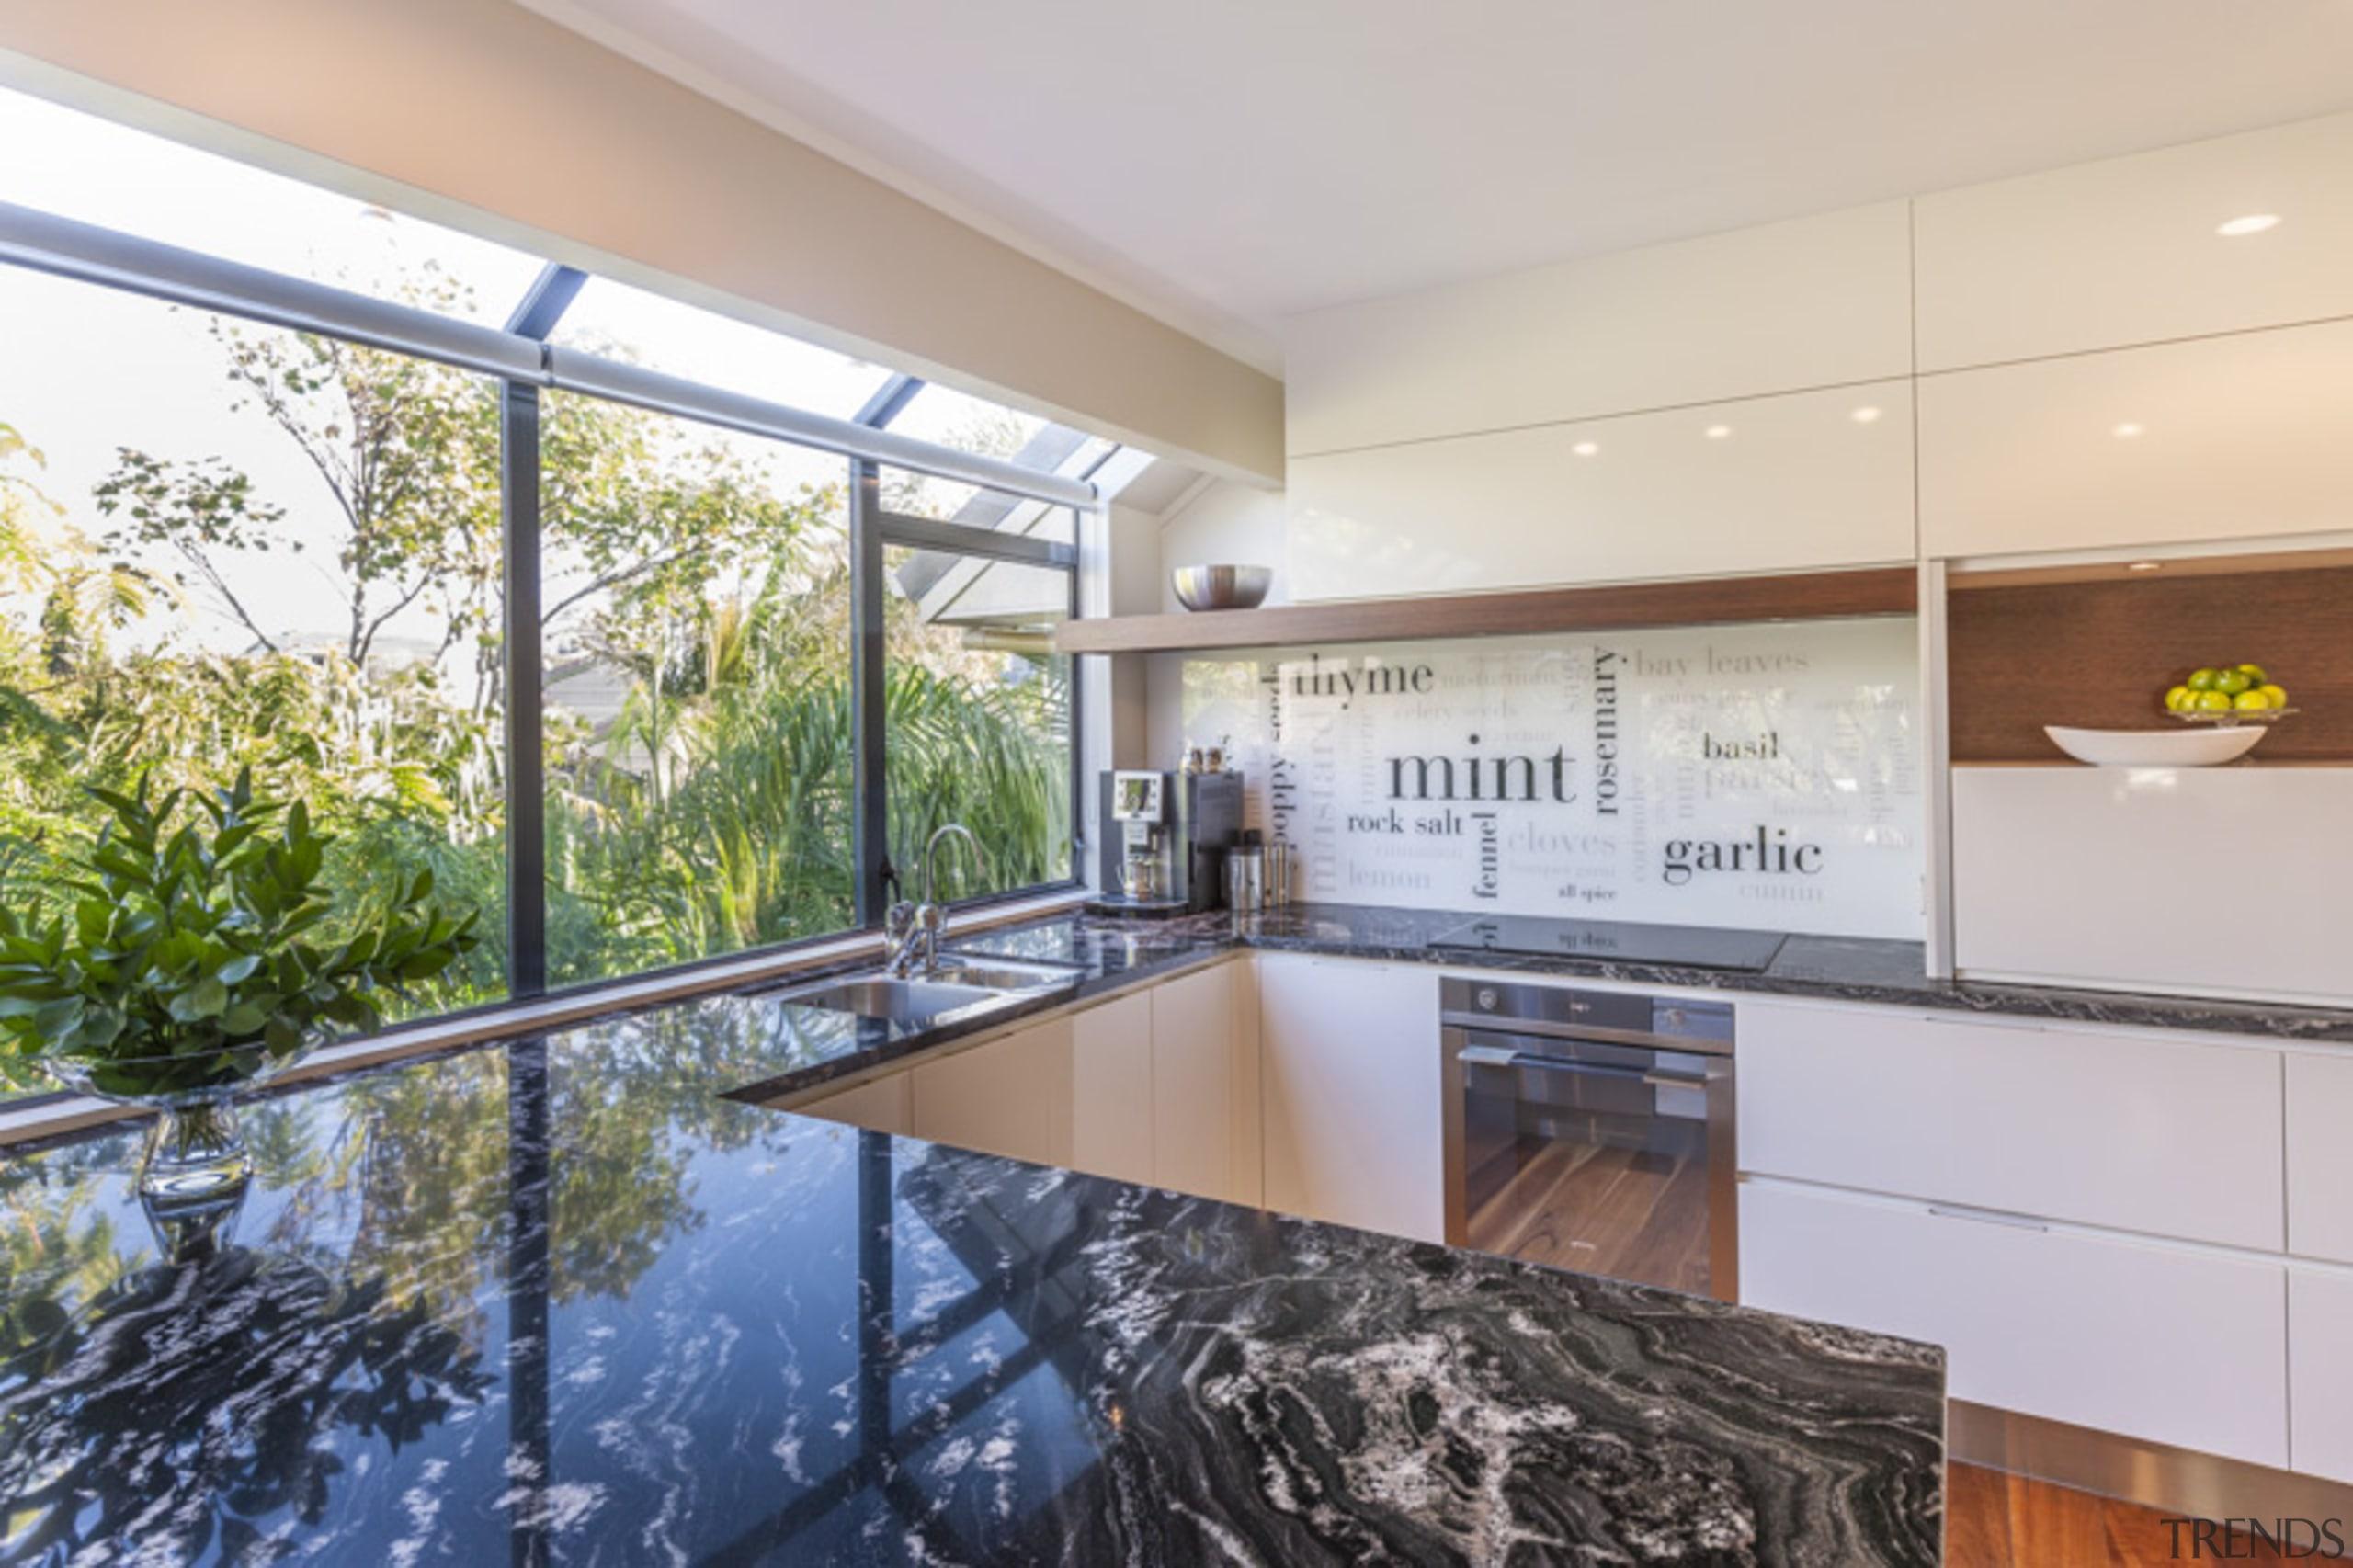 St. Heliers II - countertop   estate   countertop, estate, house, interior design, kitchen, property, real estate, window, gray